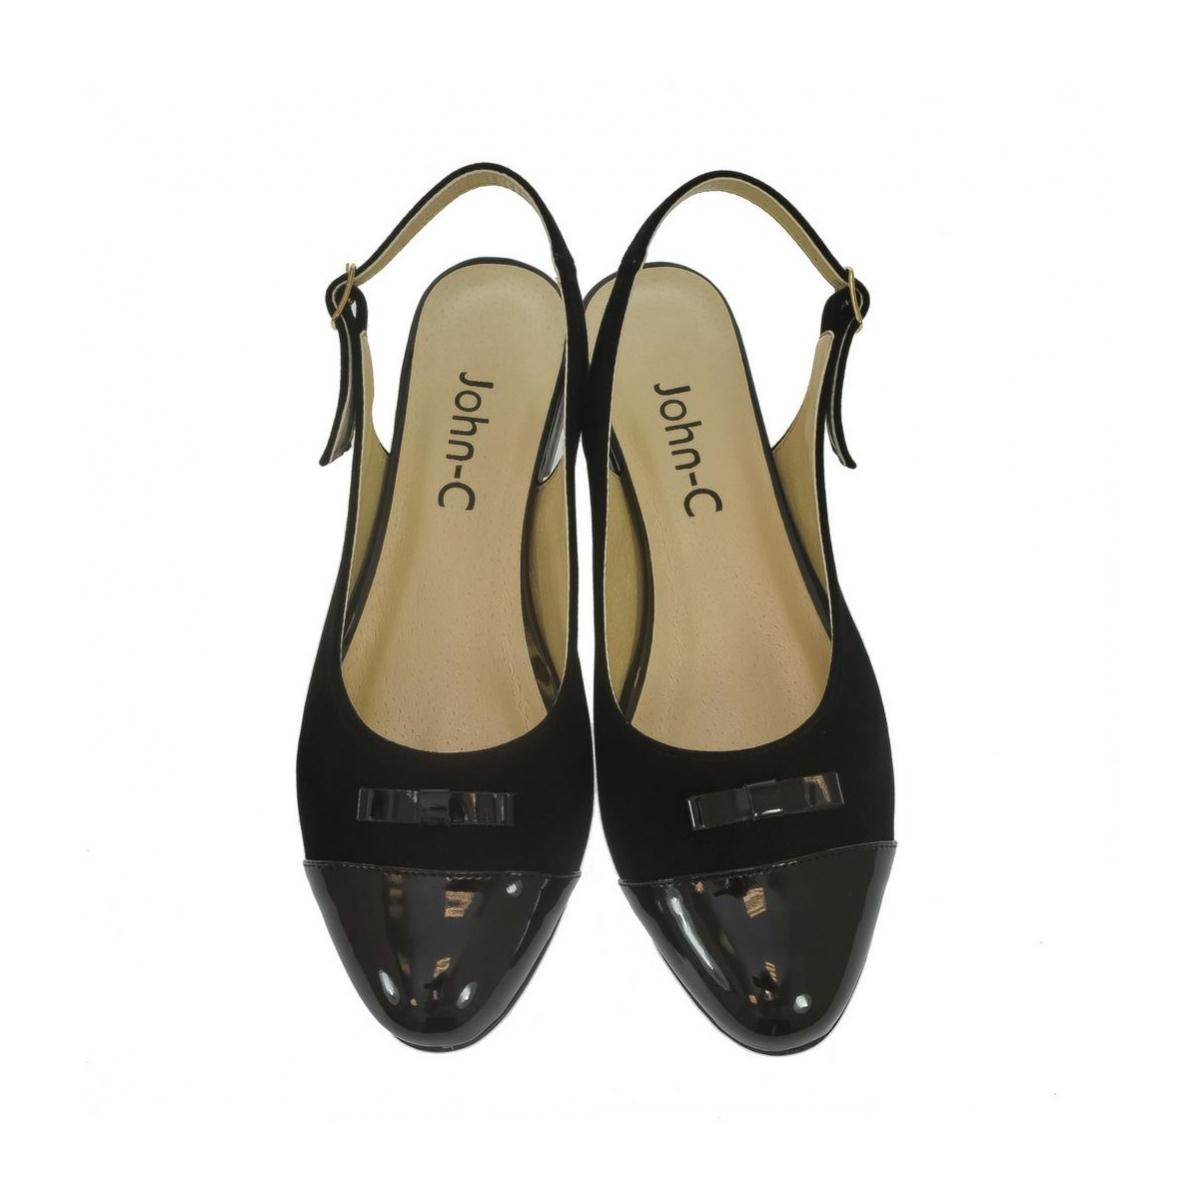 be05dc86094d Dámske čierne sandále EVELINE - 4